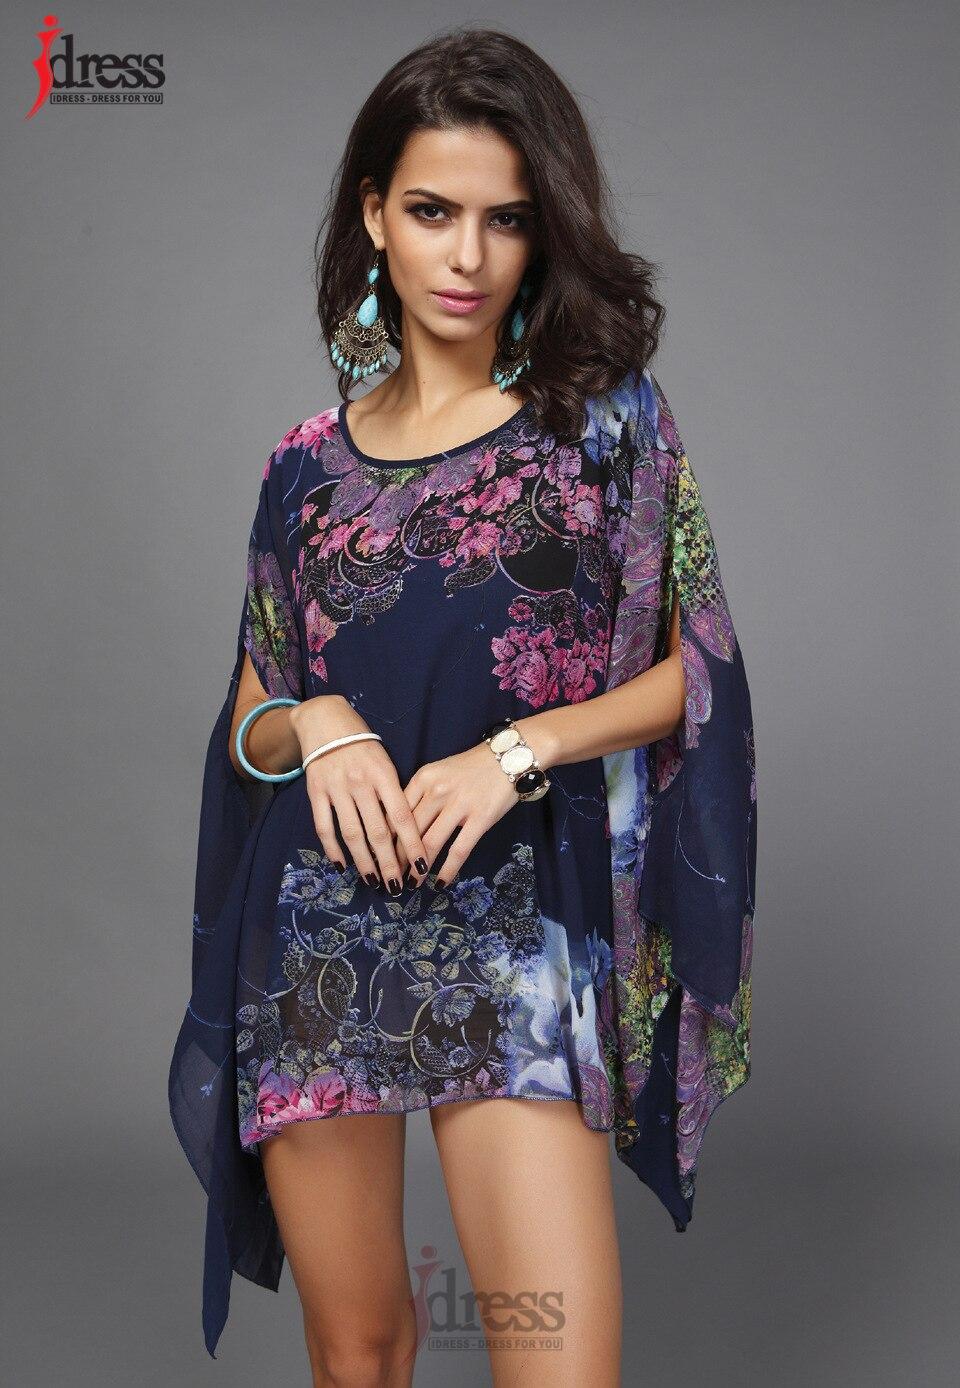 IDress Plus Size Women Clothing 2017 Summer Fashion Sexy Chiffon Tops for Women Vintage African Print Short Sleeve Sexy T Shirt (3)